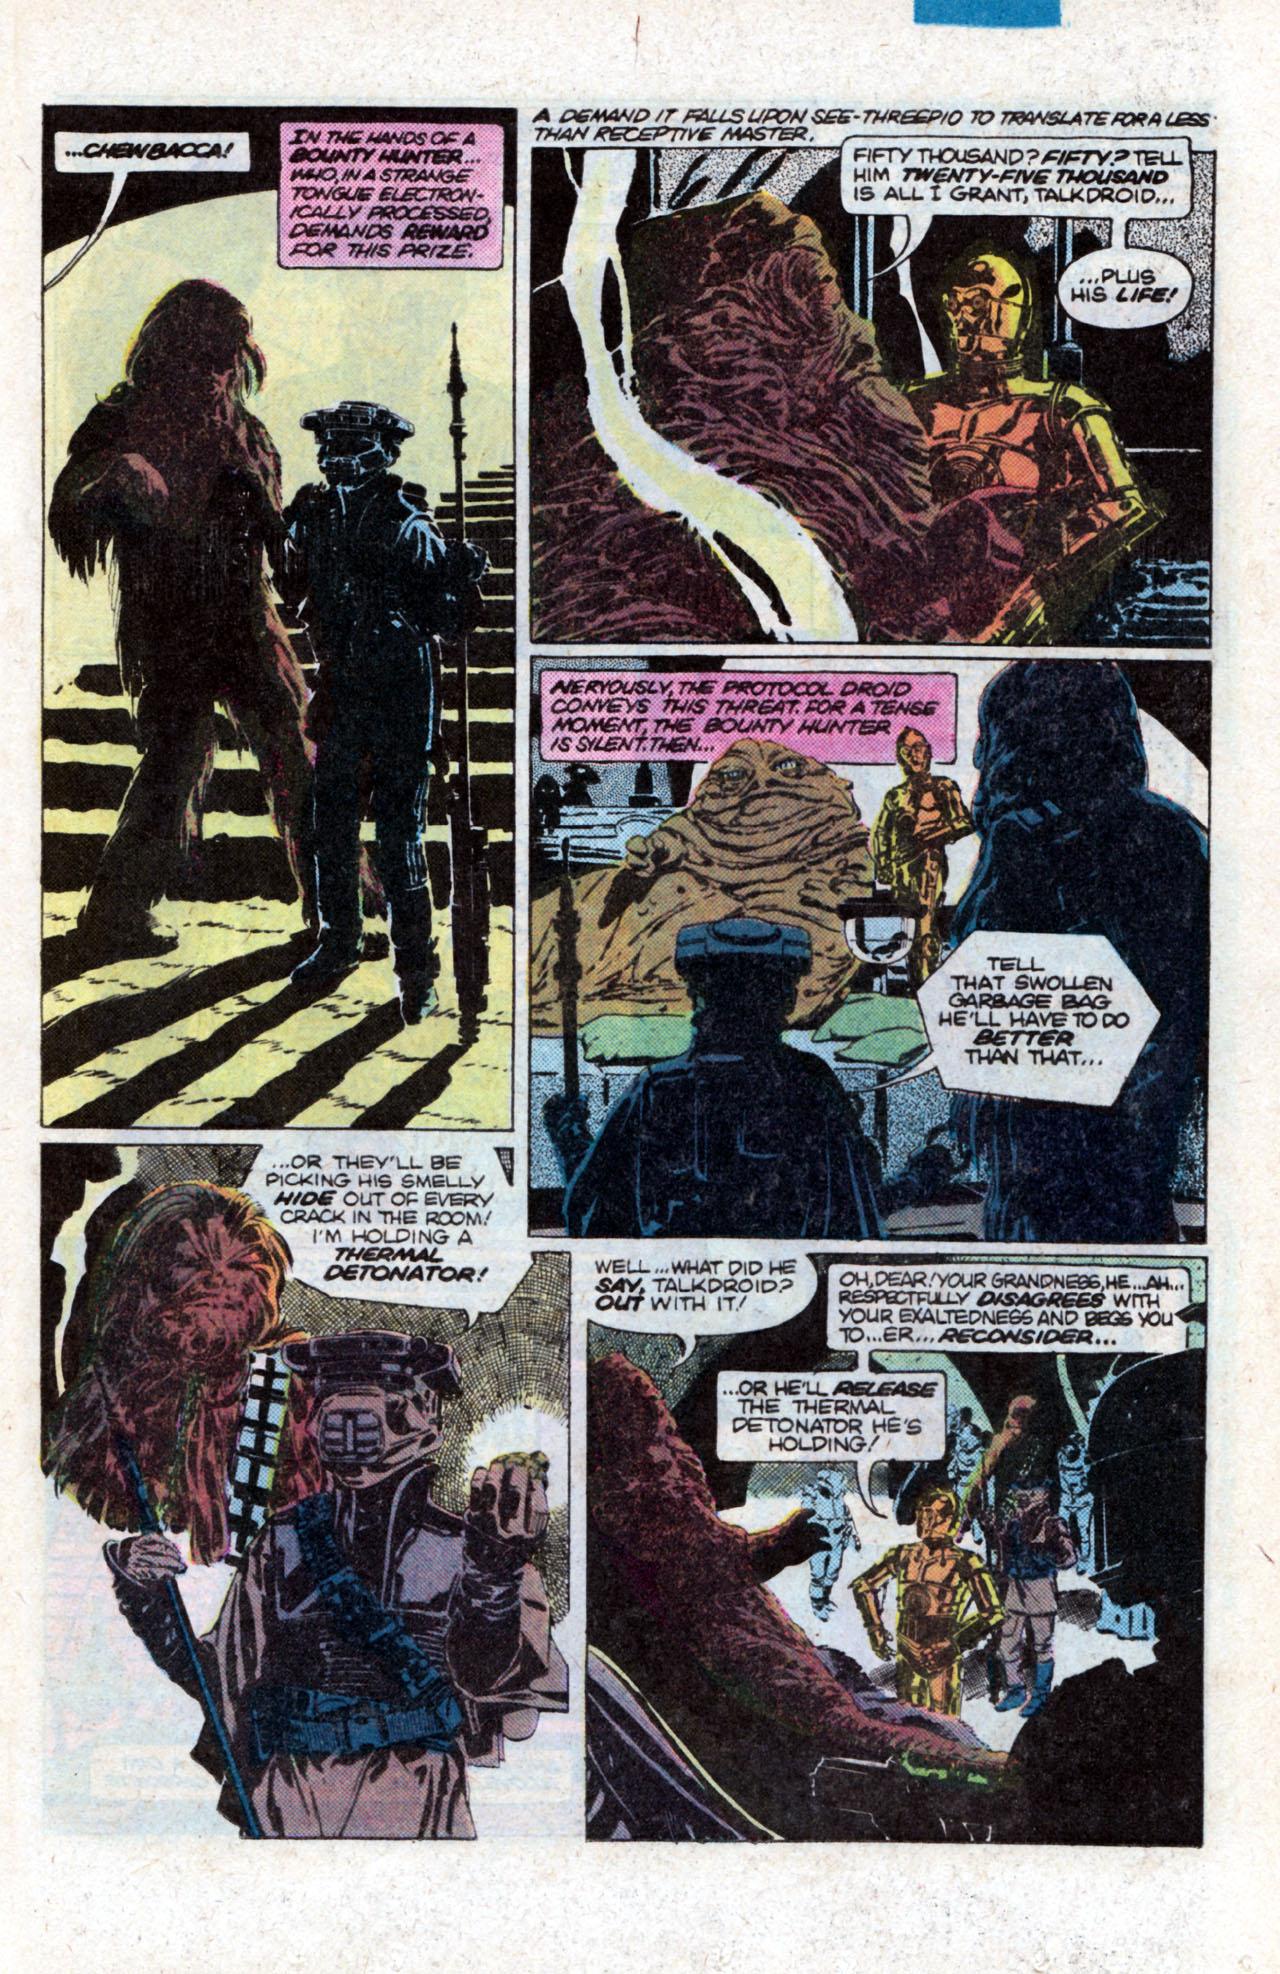 Read online Star Wars: Return of the Jedi comic -  Issue #1 - 13